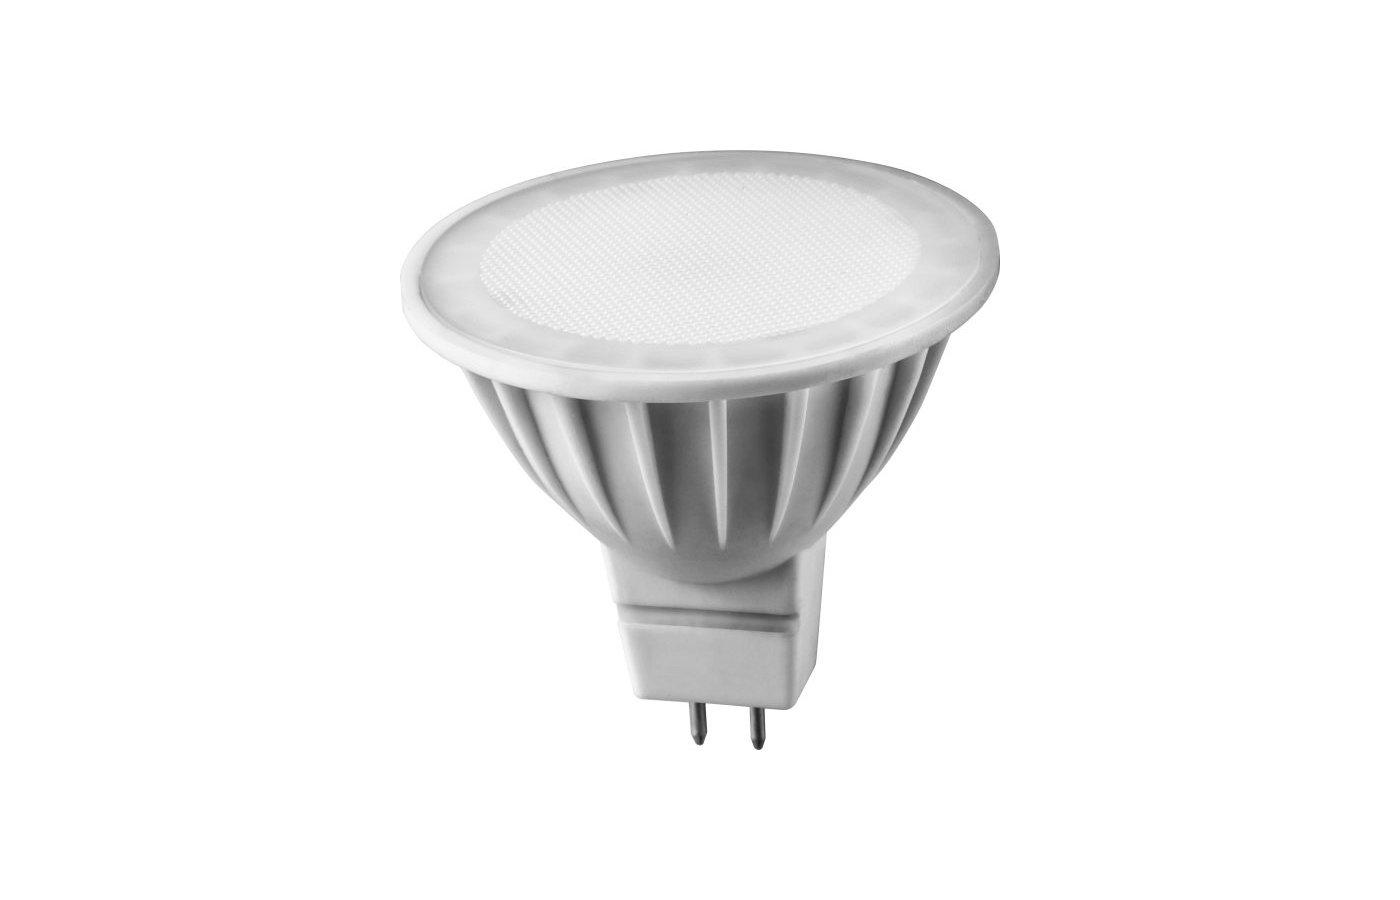 Лампочки LED ОНЛАЙТ LED 637 OLL-MR16-5-230-3K-GU5.3